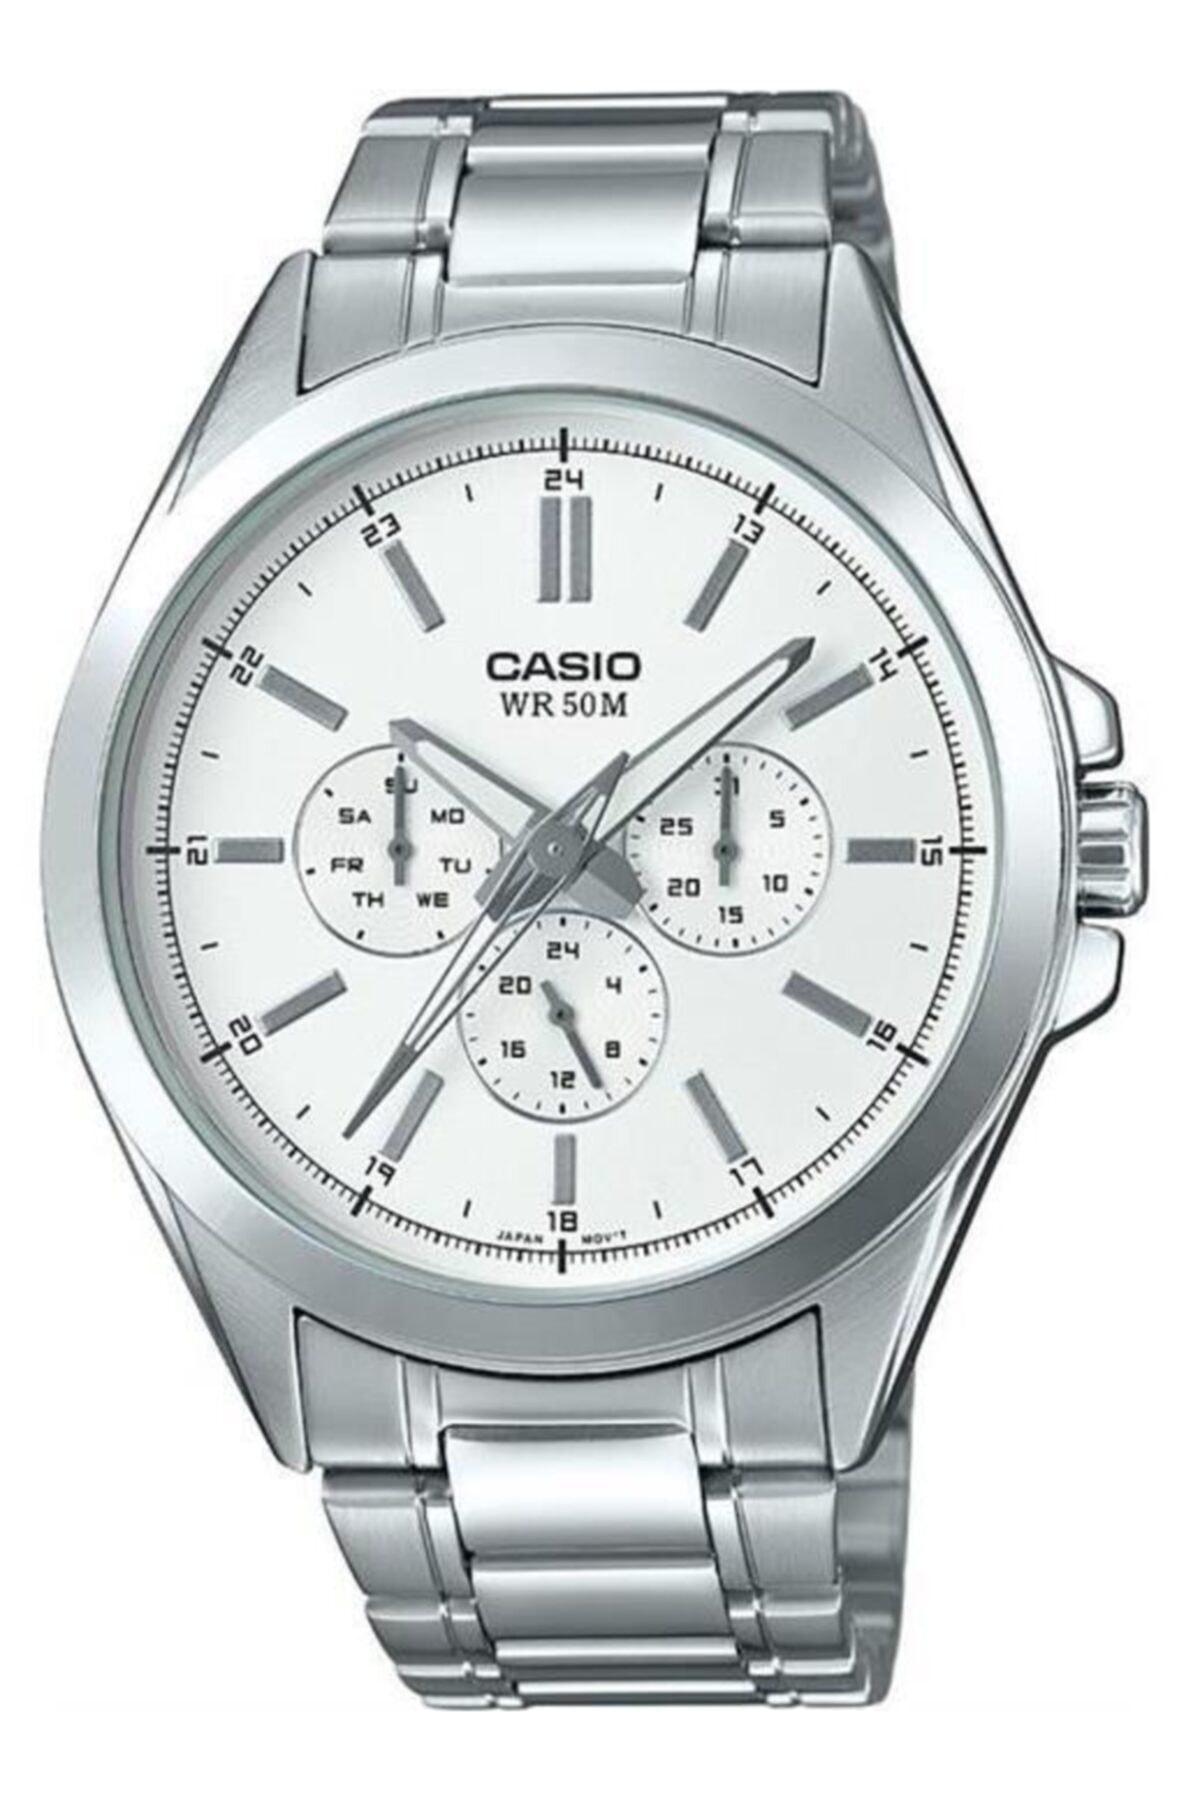 Casio Mtp-sw300d-7avdf Erkek Kol Saati 2